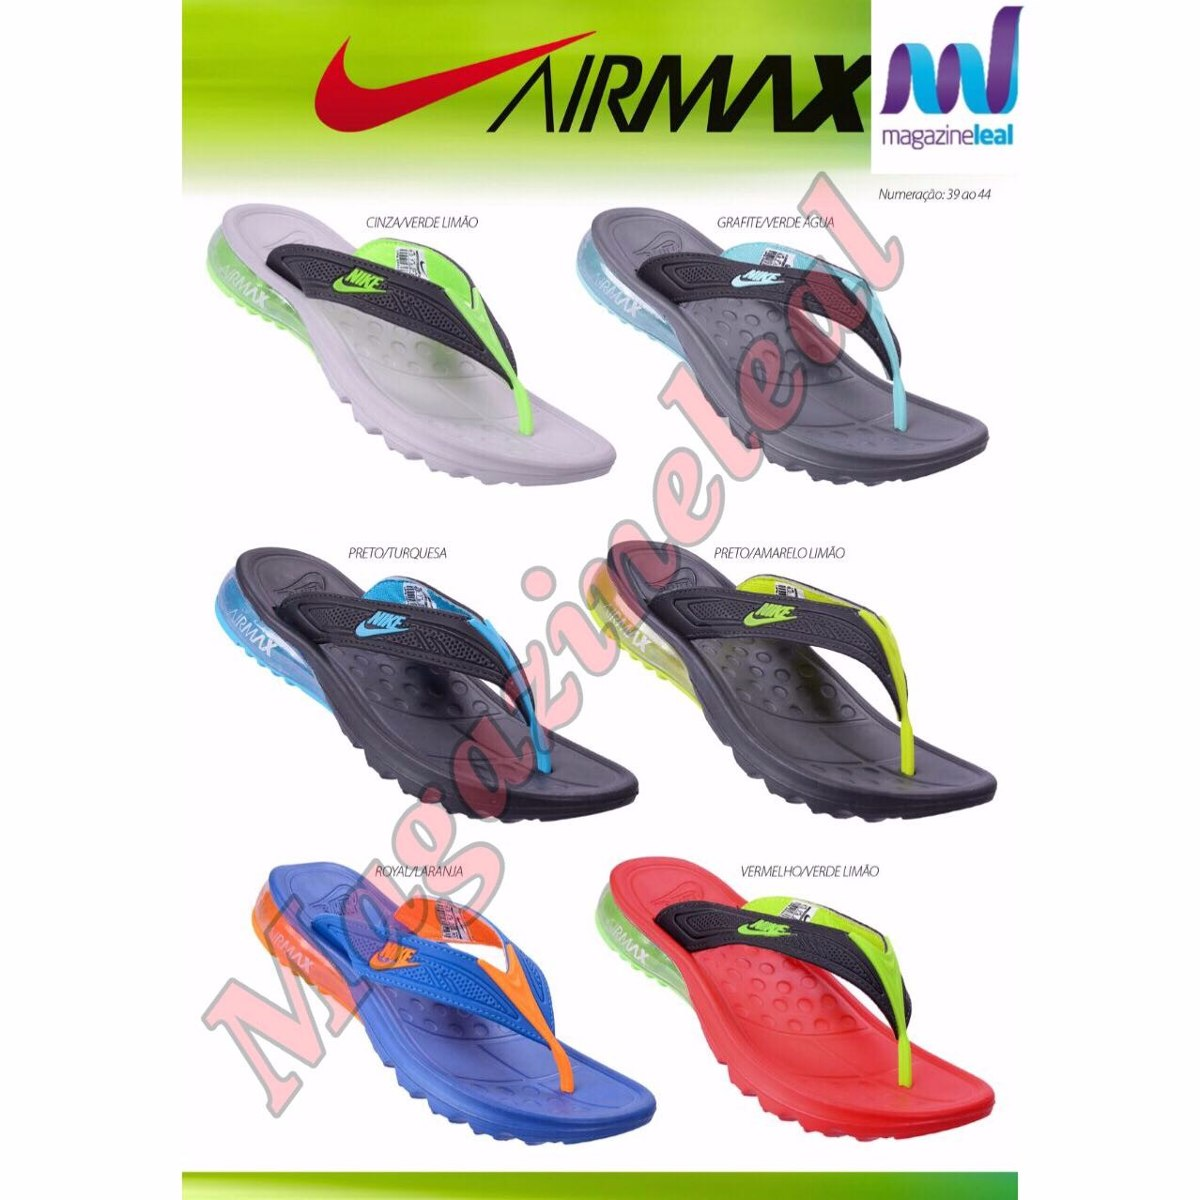 947873c9c99 Chinelo Nike Air Max